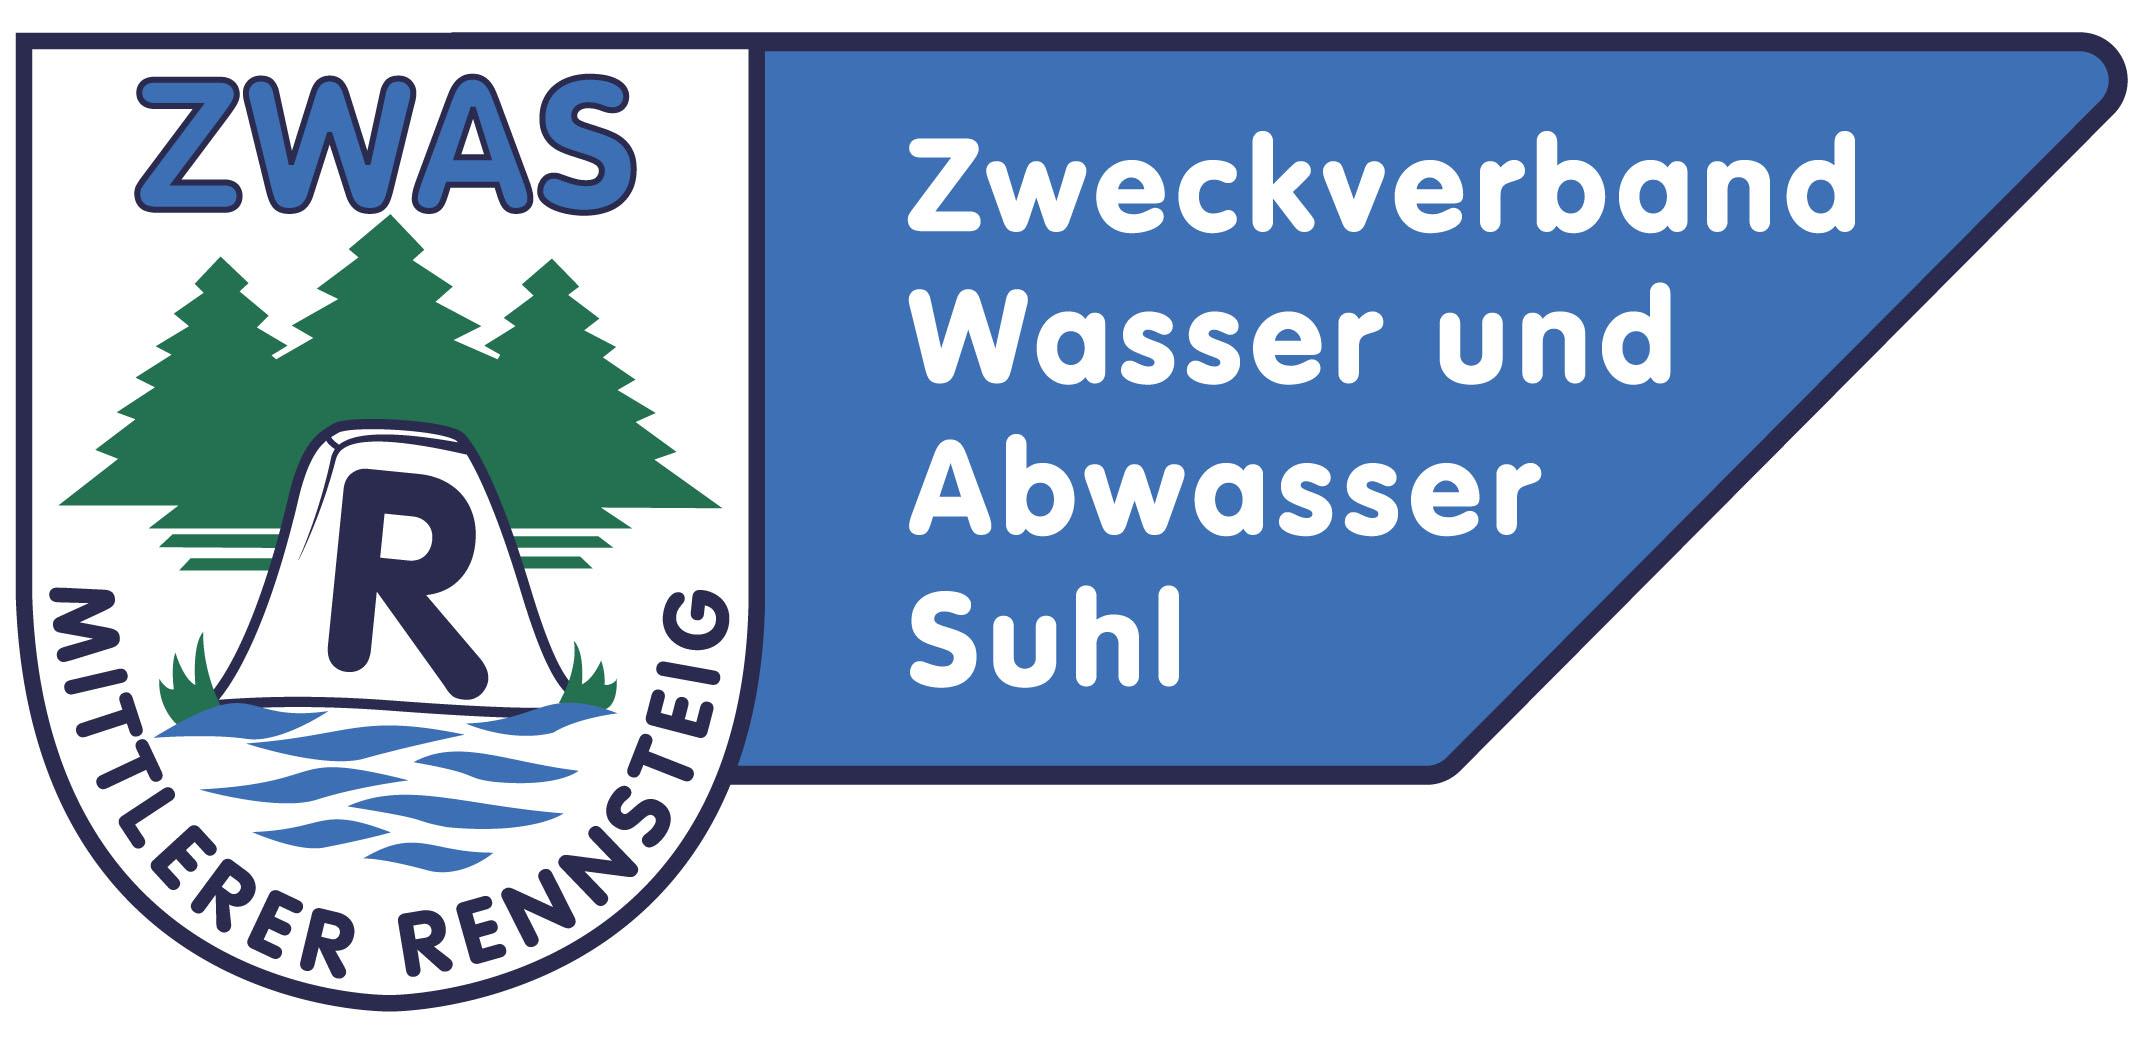 zwas logo suhl